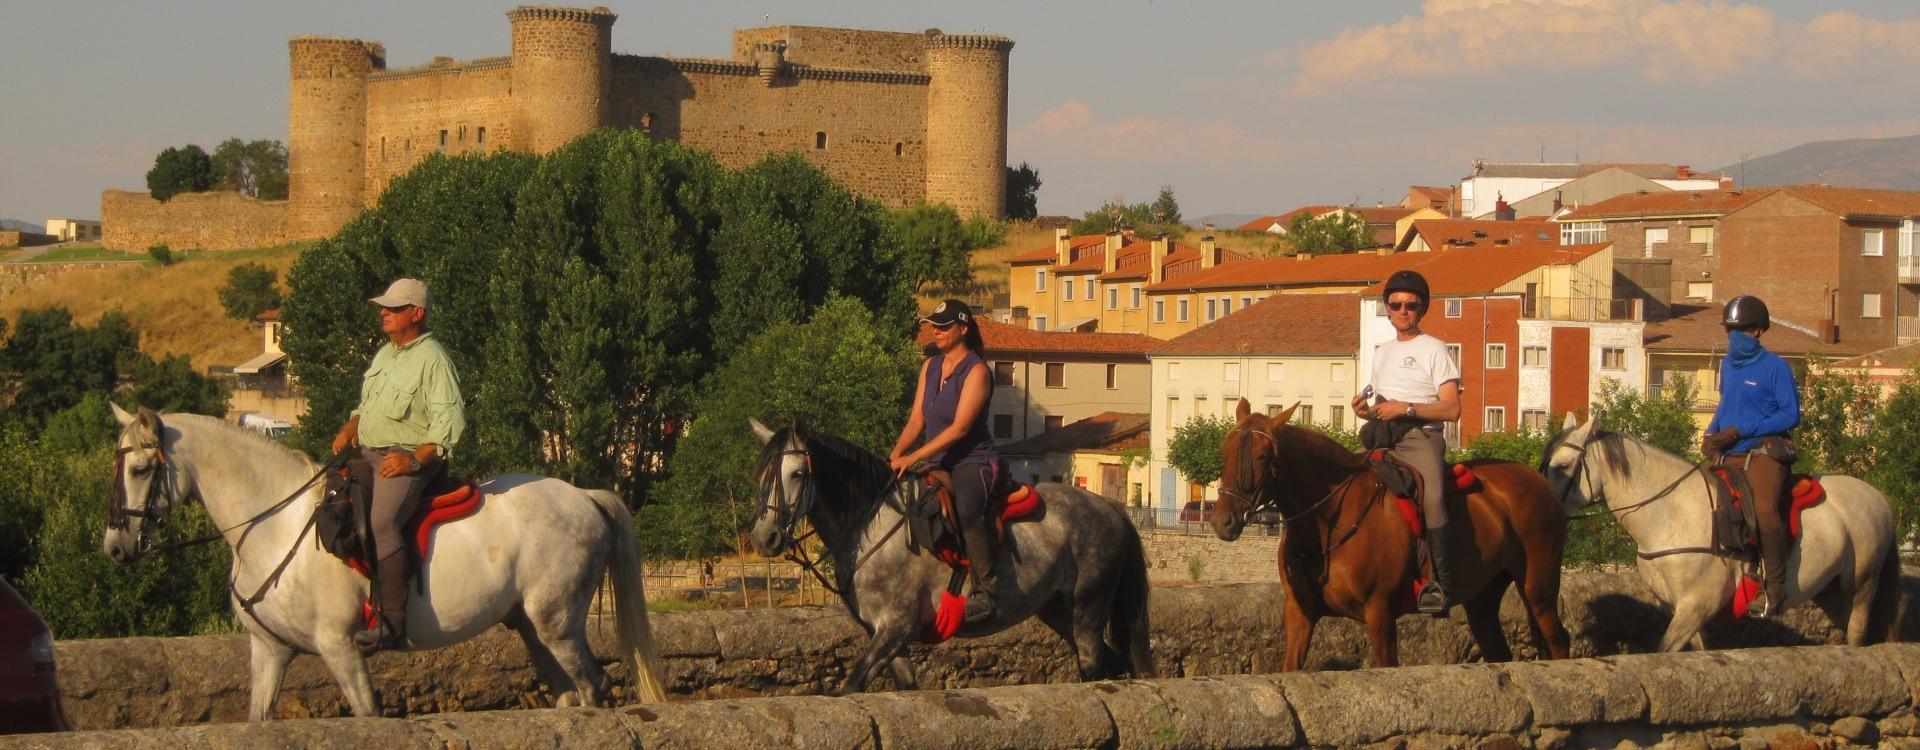 Riding in the Sierra de Gredos